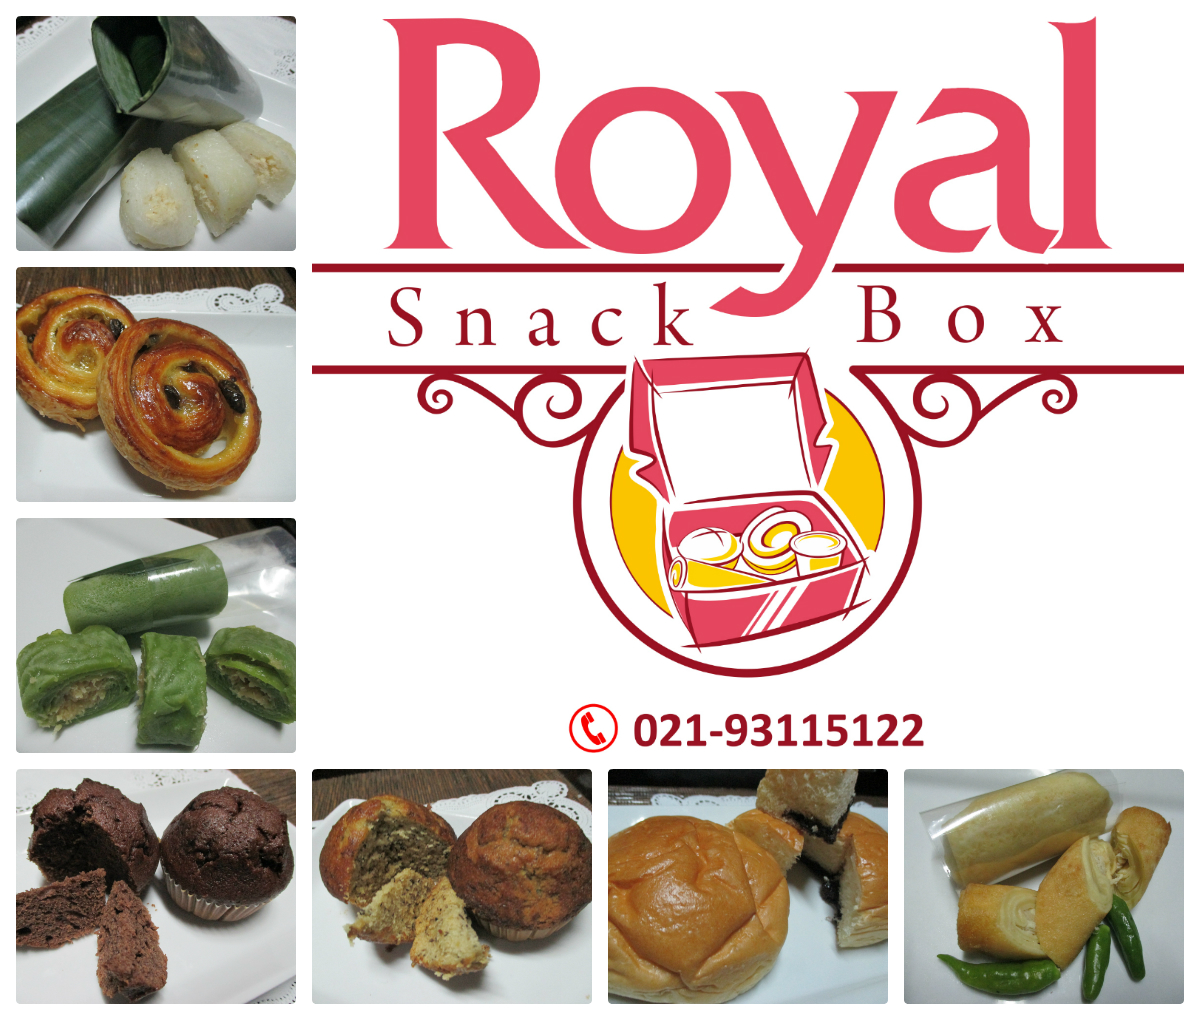 Snack Box Delivery Jakarta Selatan